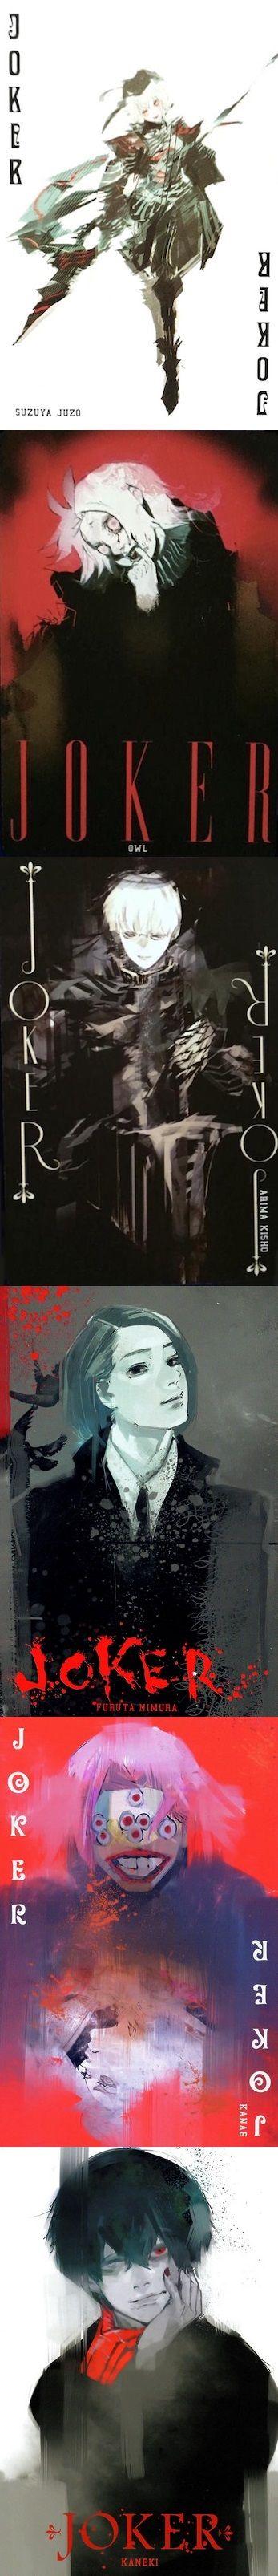 Tokyo Ghoul || Ishida Sui || Trump Cards || Jokers